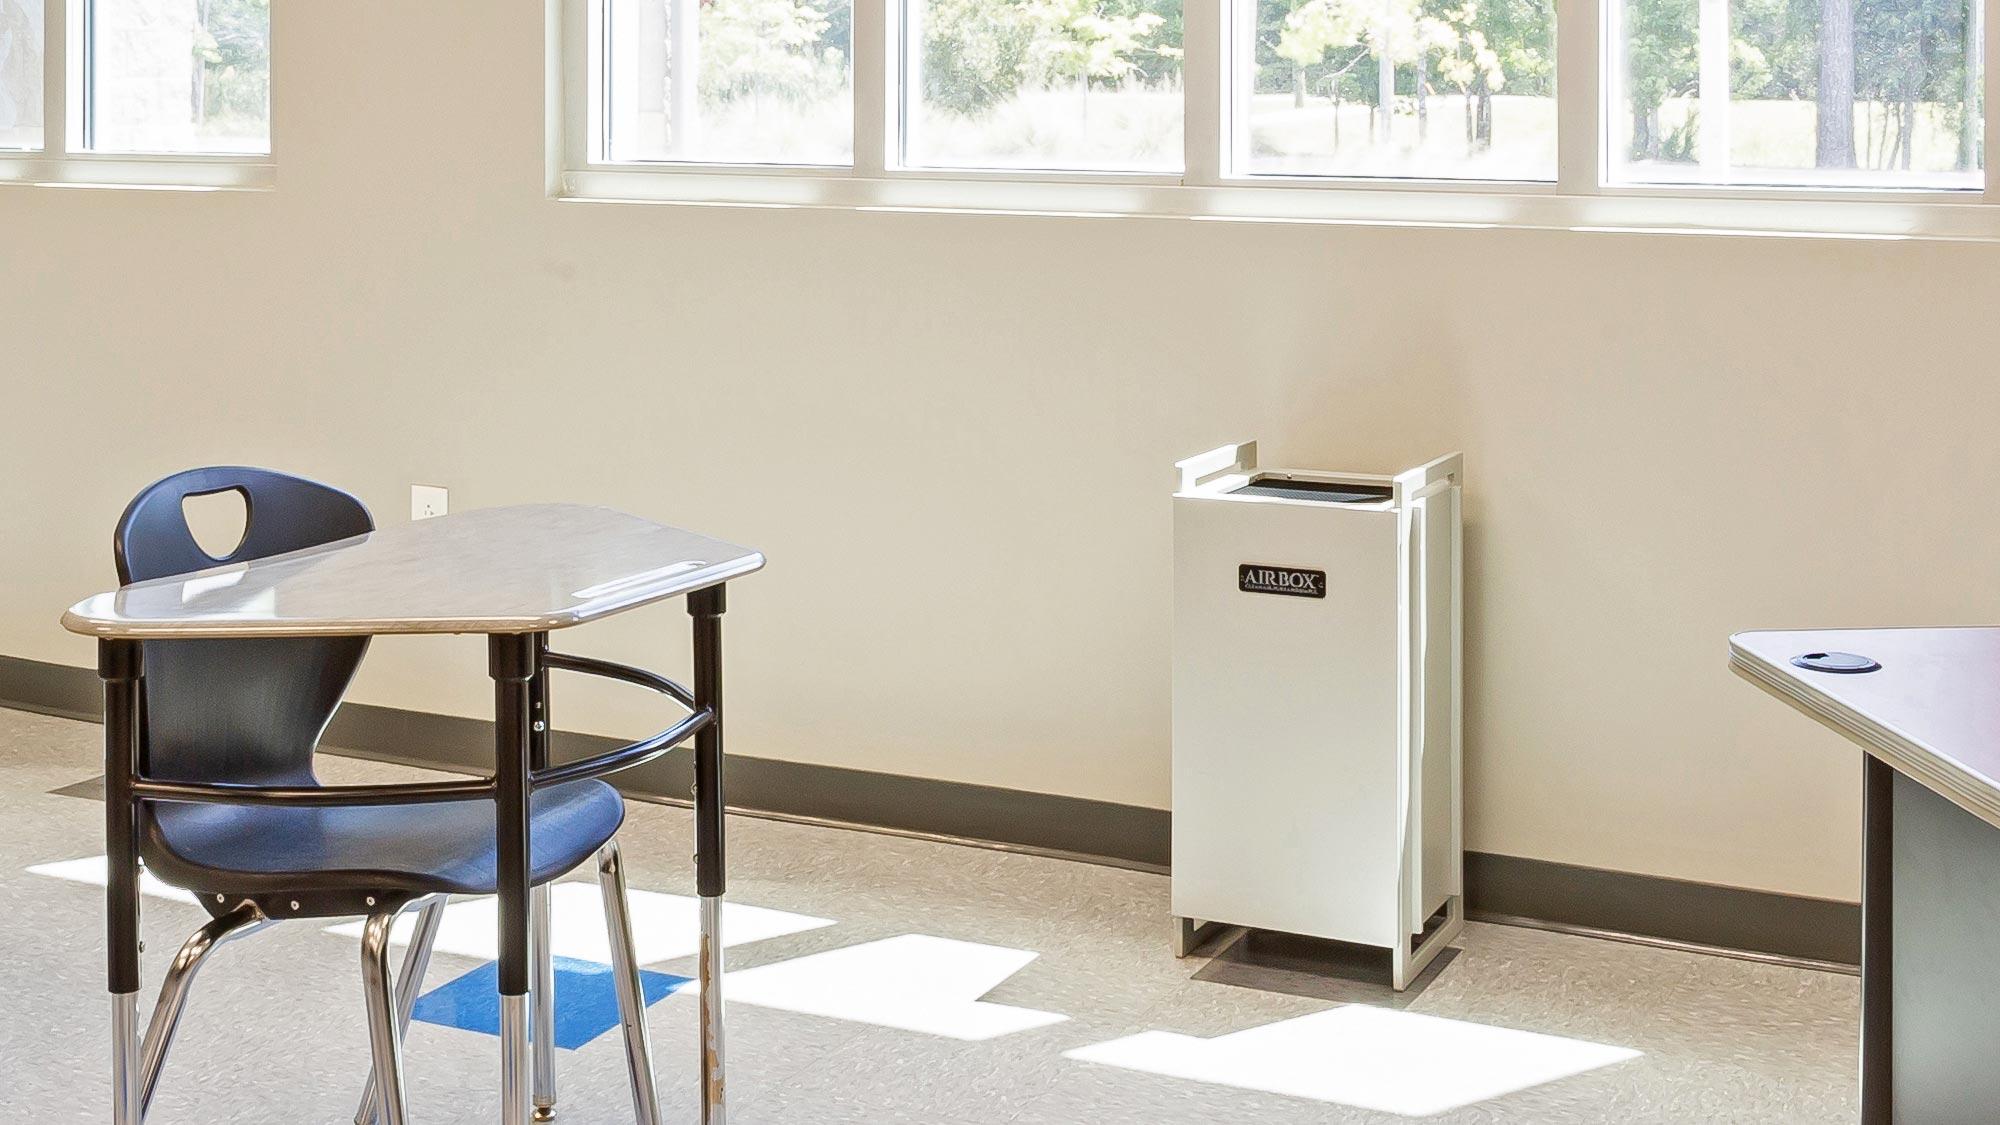 AirBox Peak Series-S Air Purifier